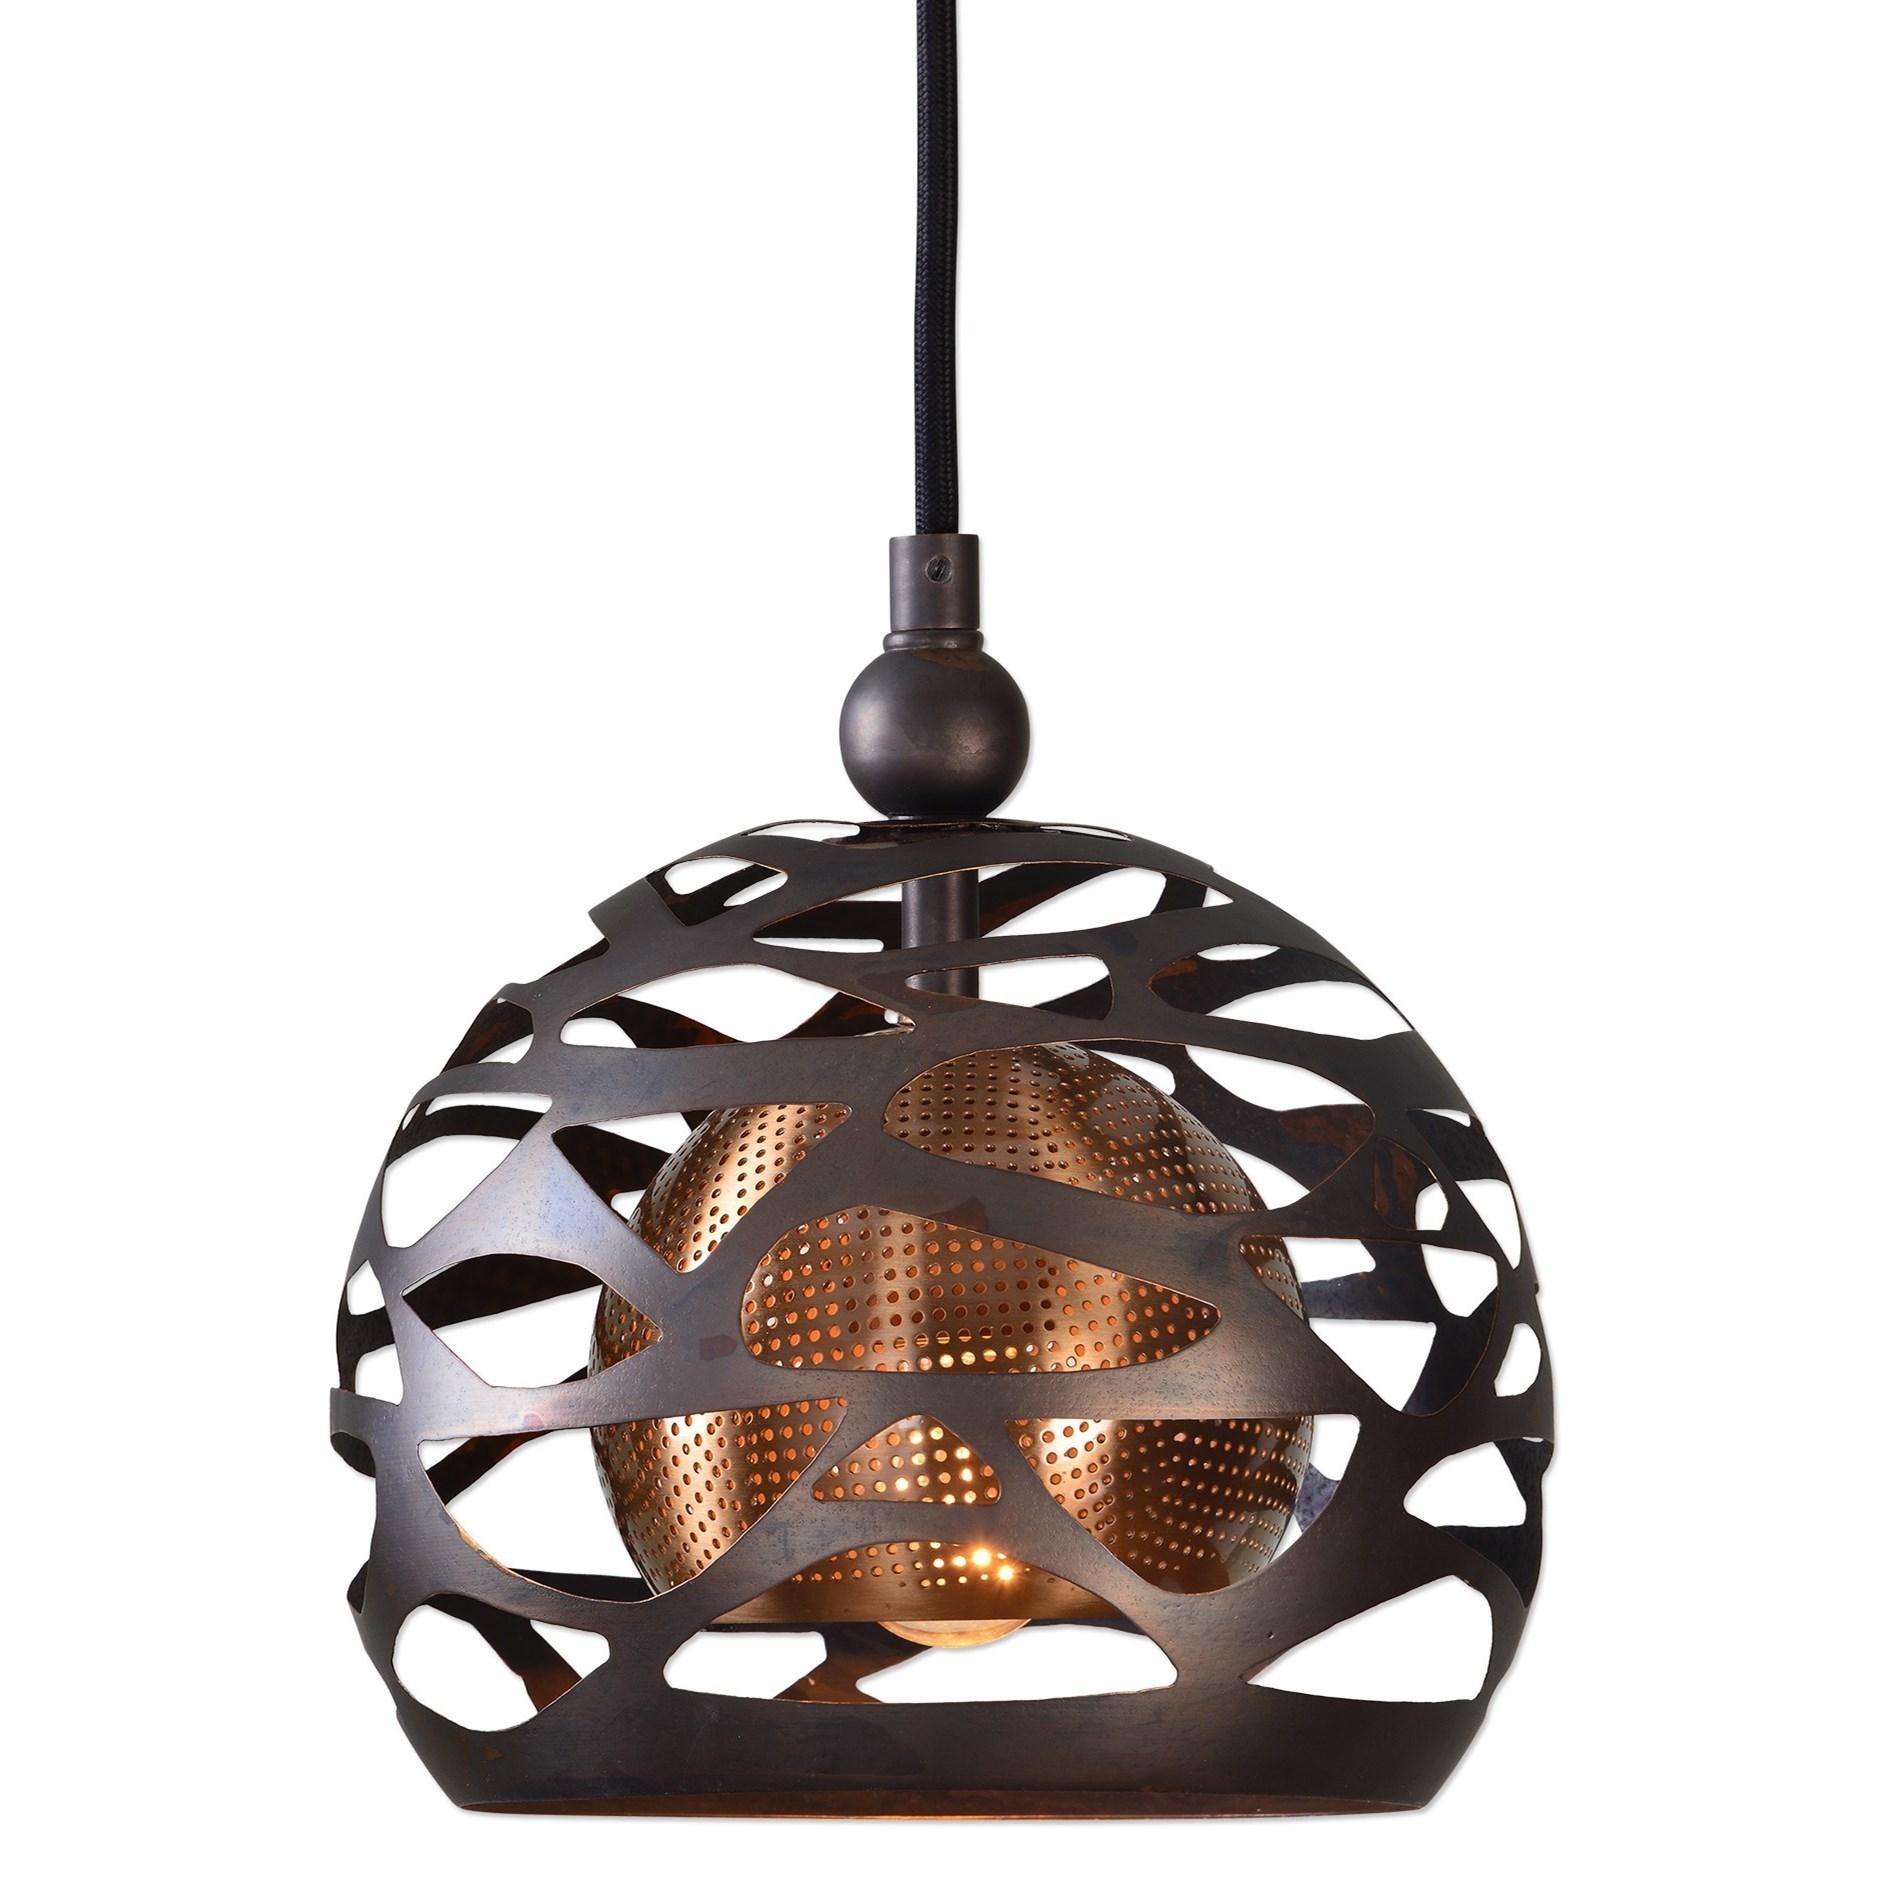 Uttermost Lighting Fixtures Parth 1 Light Bronze Mini Pendant - Item Number: 22085